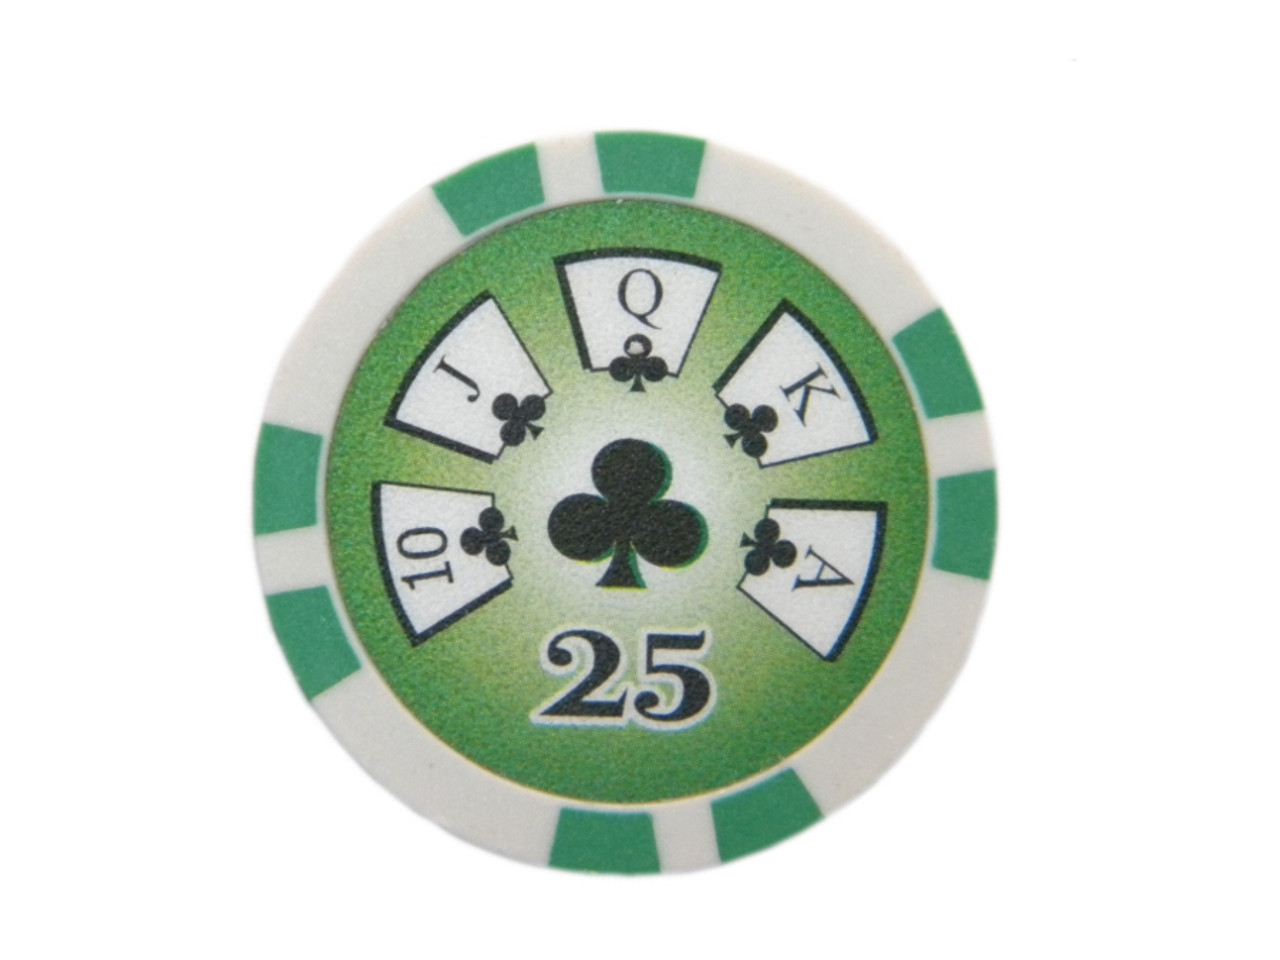 Fisic 25 jetoane Royal Flush - Verzi - Valoare printata : 25